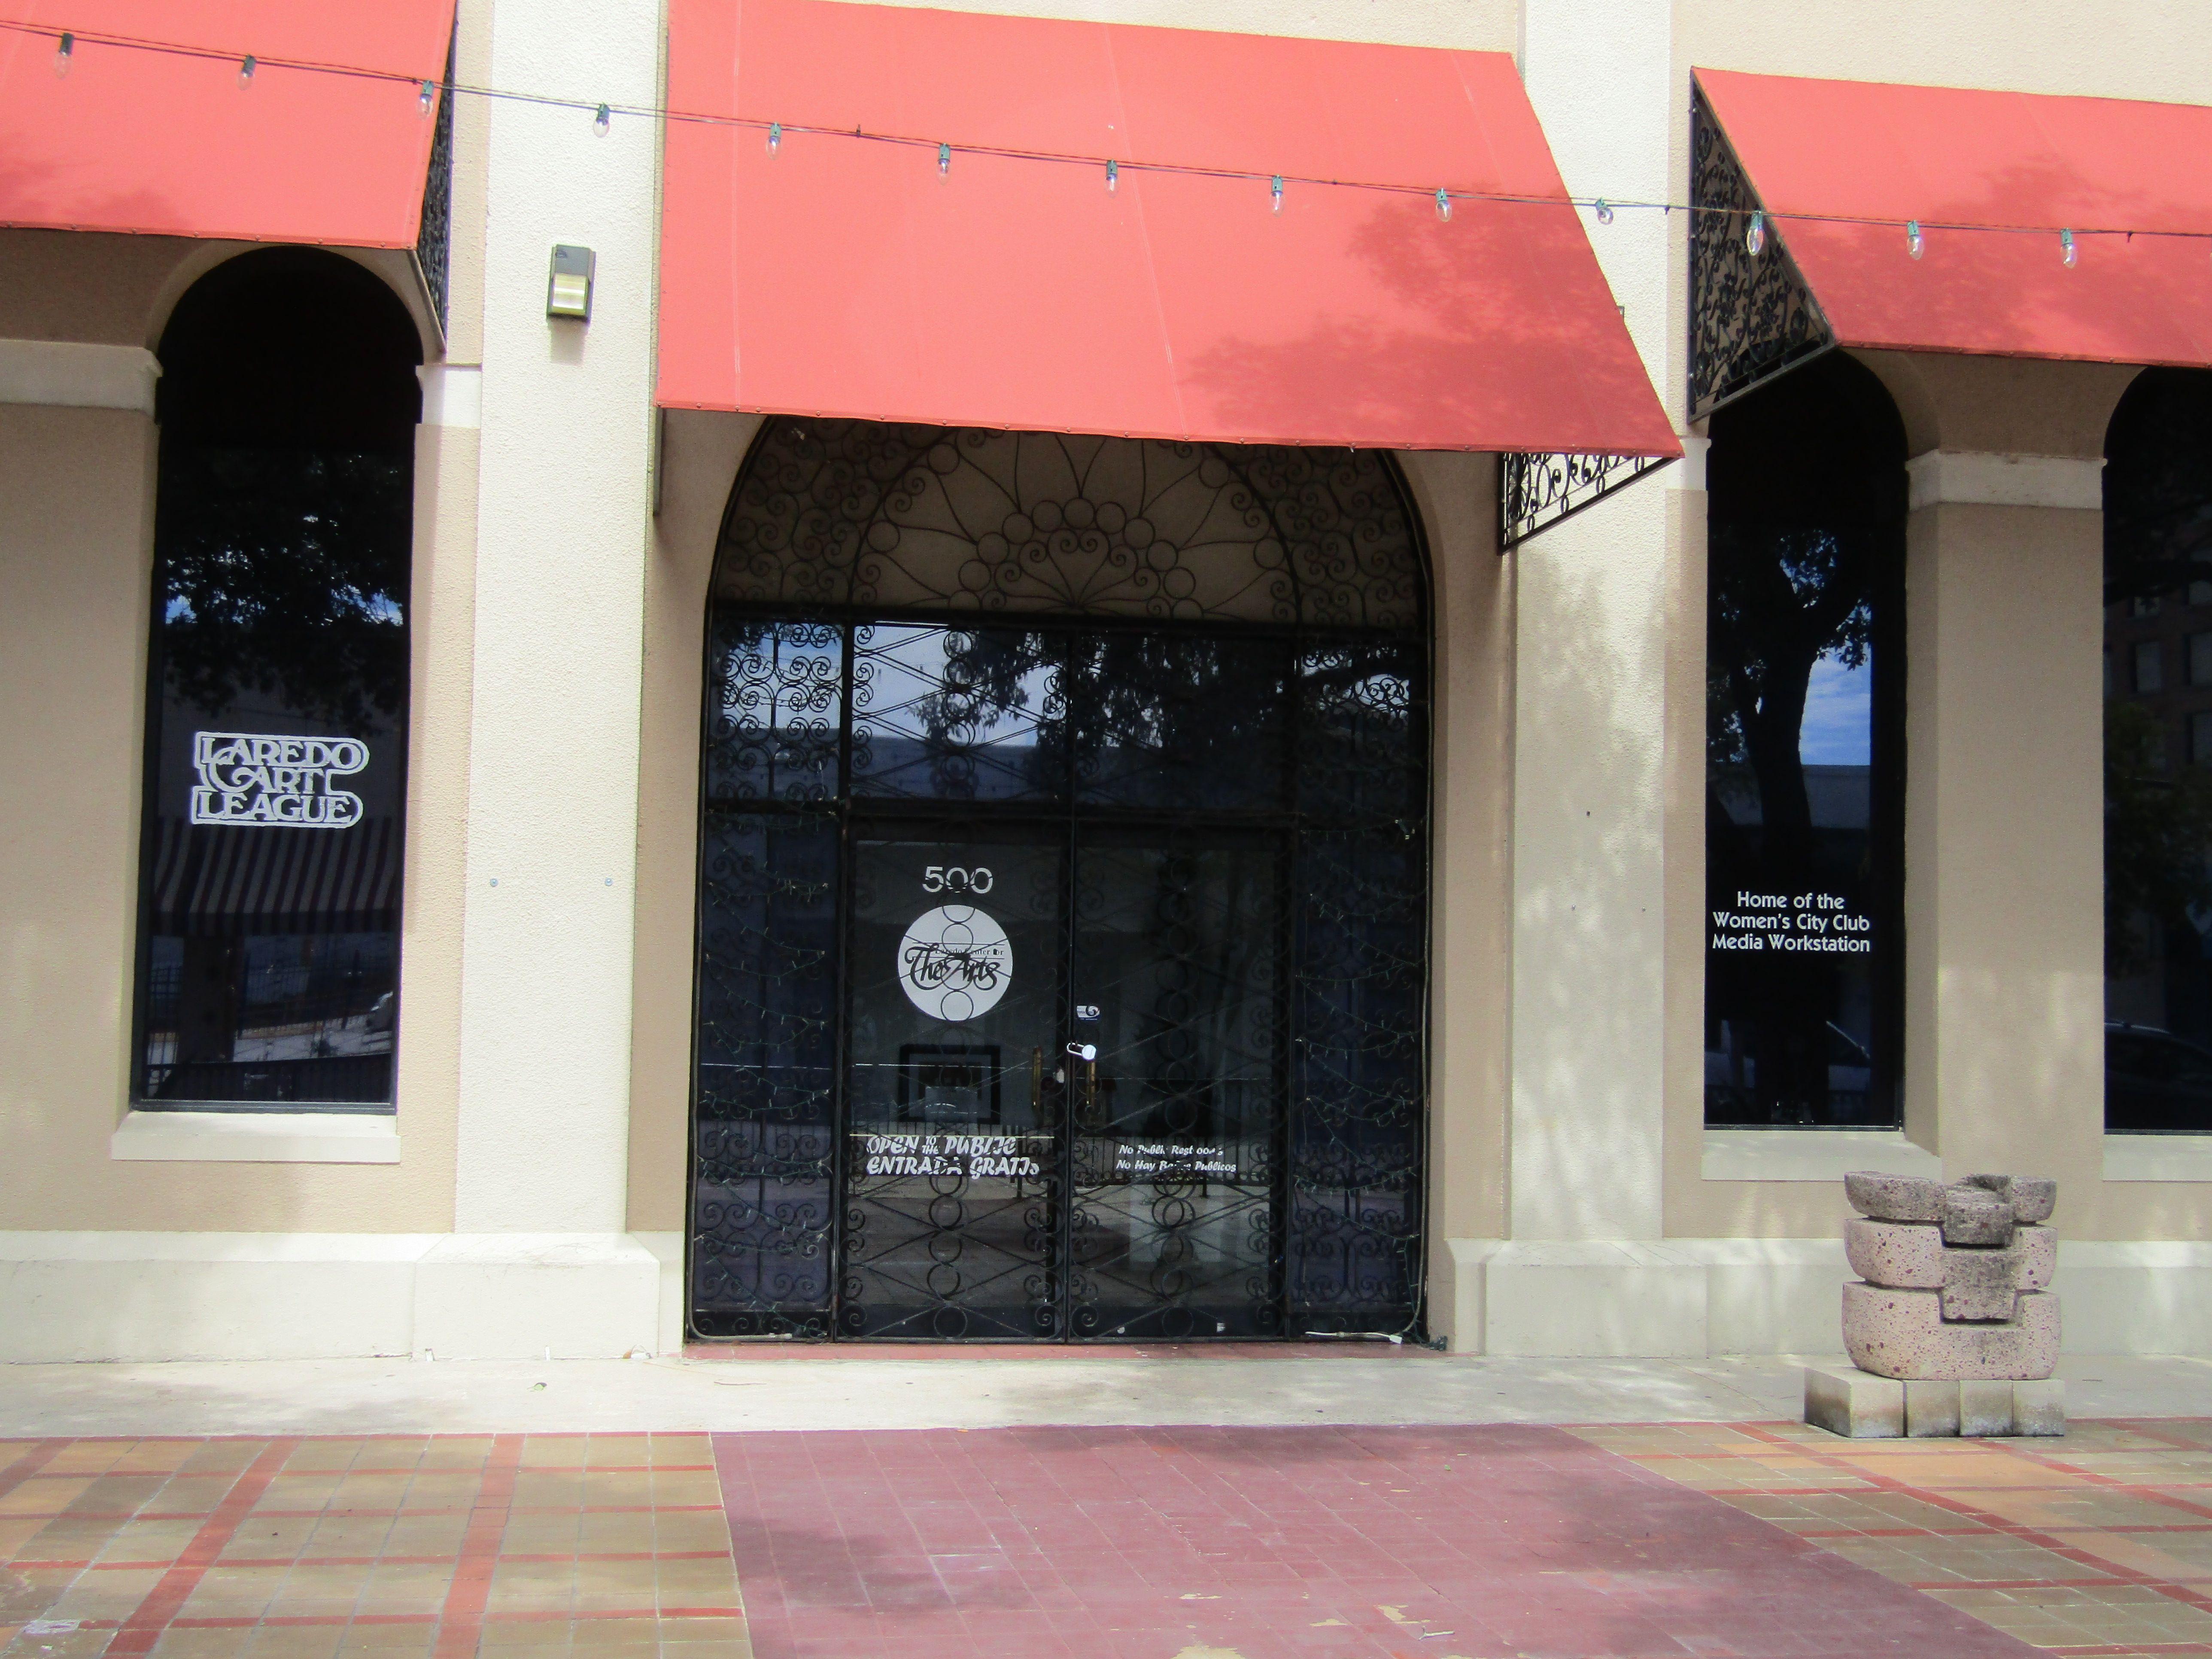 Art Walk At Laredo Center For The Arts Flores And Hidalgo Laredo Texas 5 30 Pm Laredo Art Walk Safe Cities